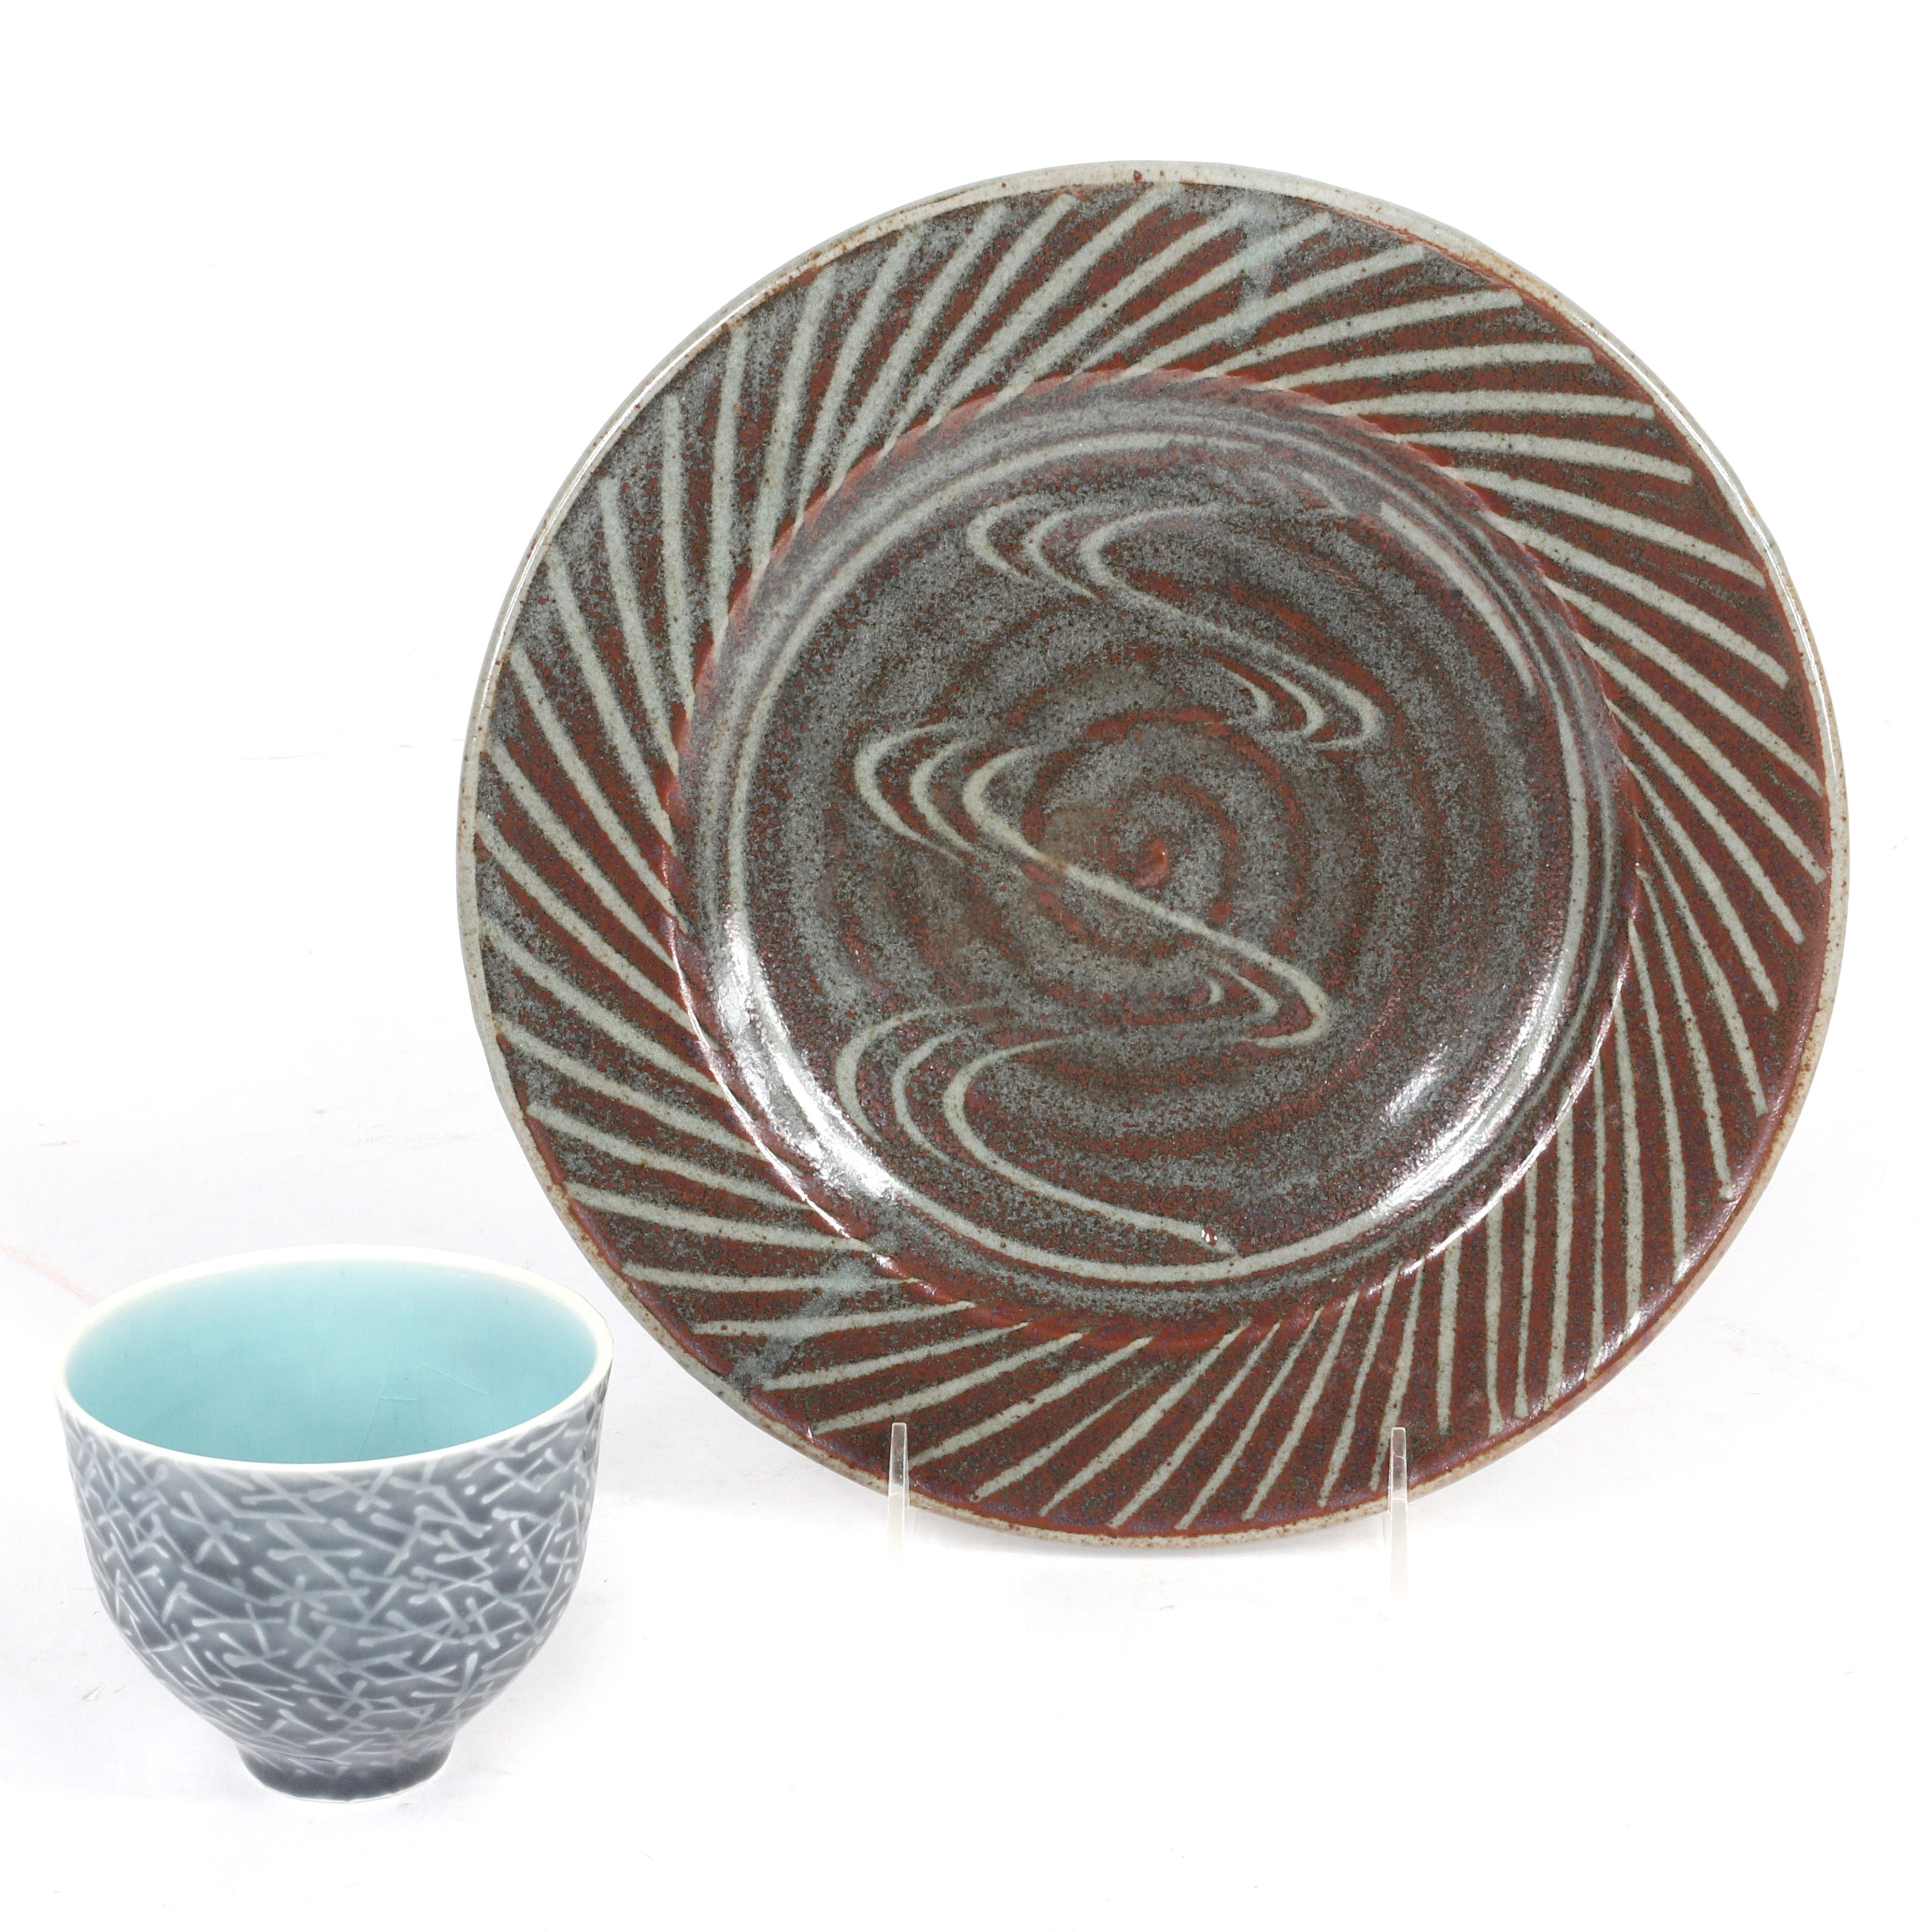 "20th Century Studio art pottery 2pc.; rice bowl and plate. 10"" diam (plate)"